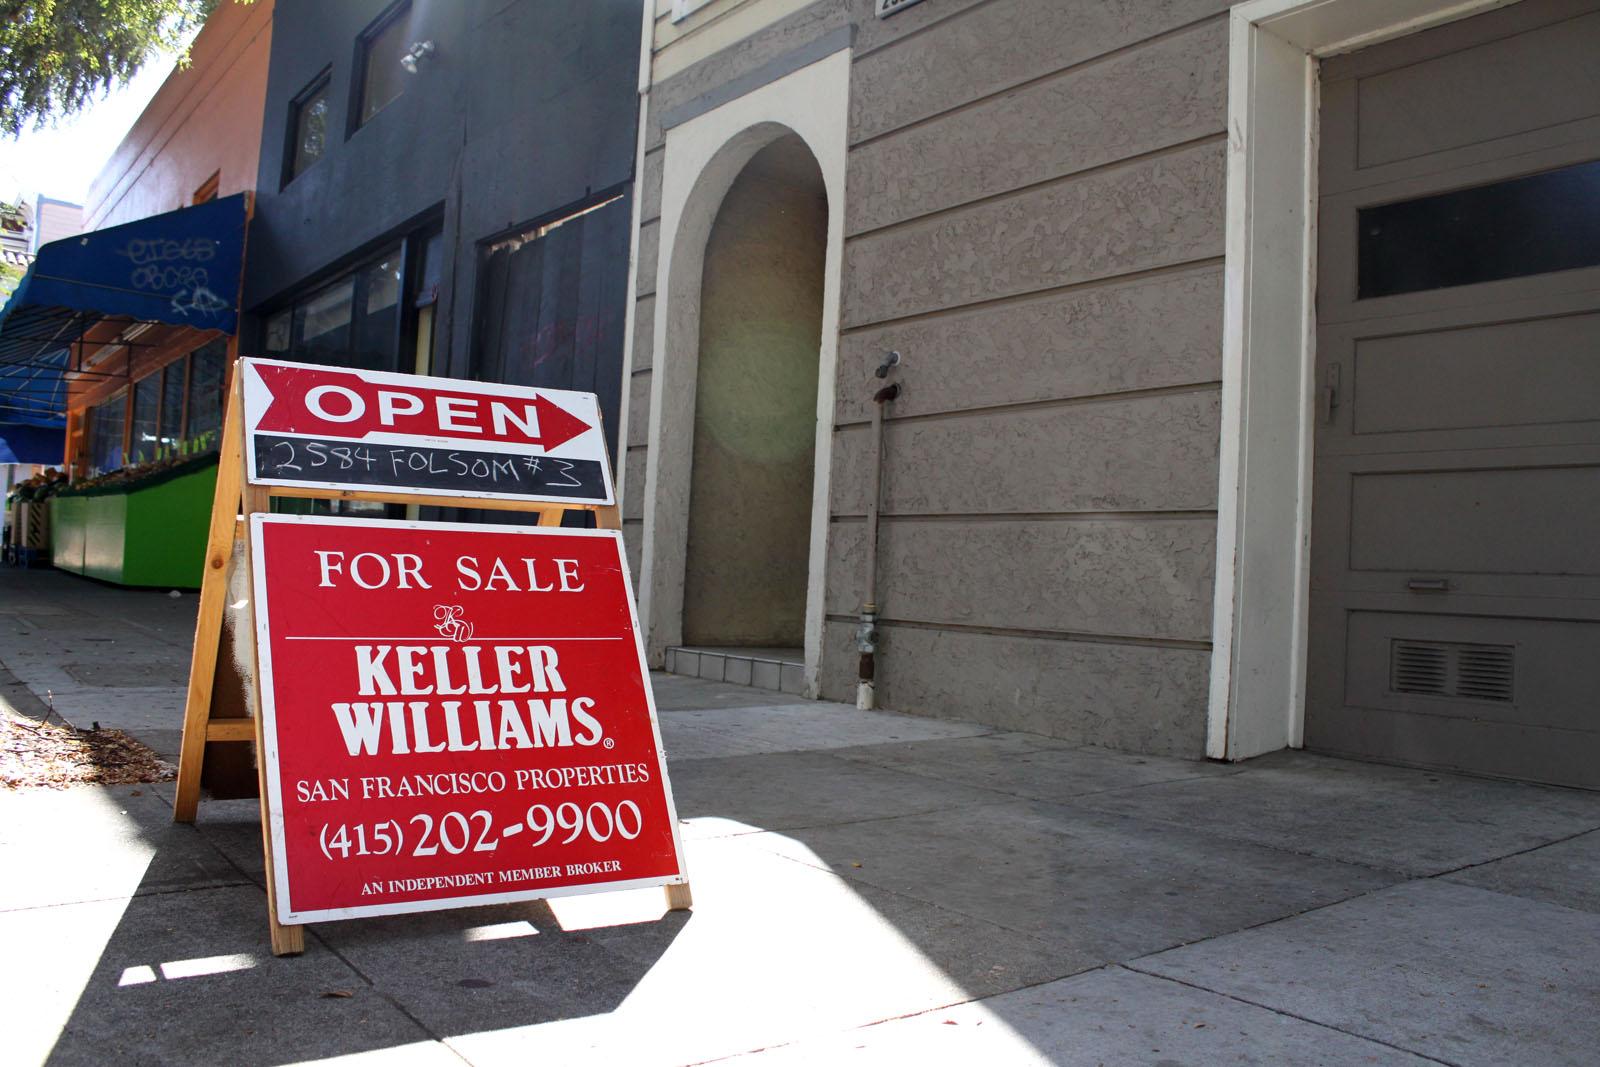 Condo for sale on Folsom Street.